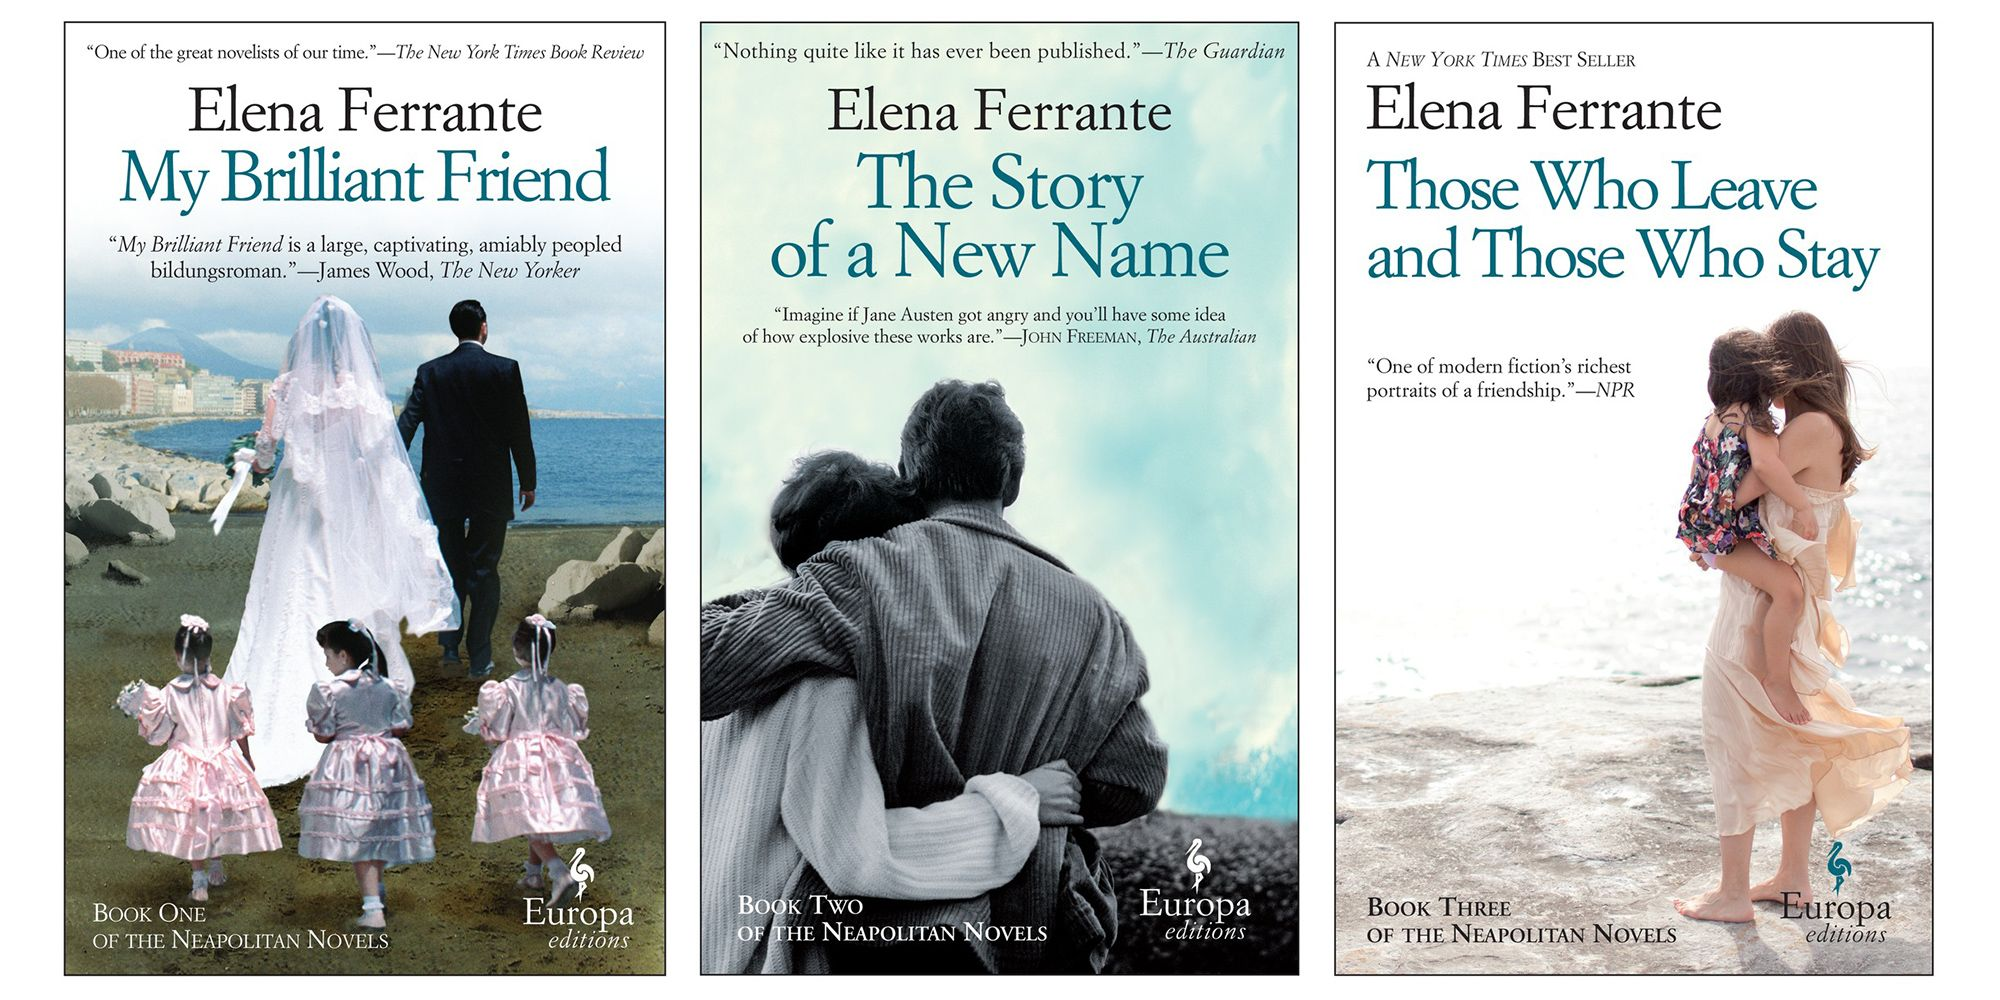 Has Elena Ferrante's True Identity Been Revealed?